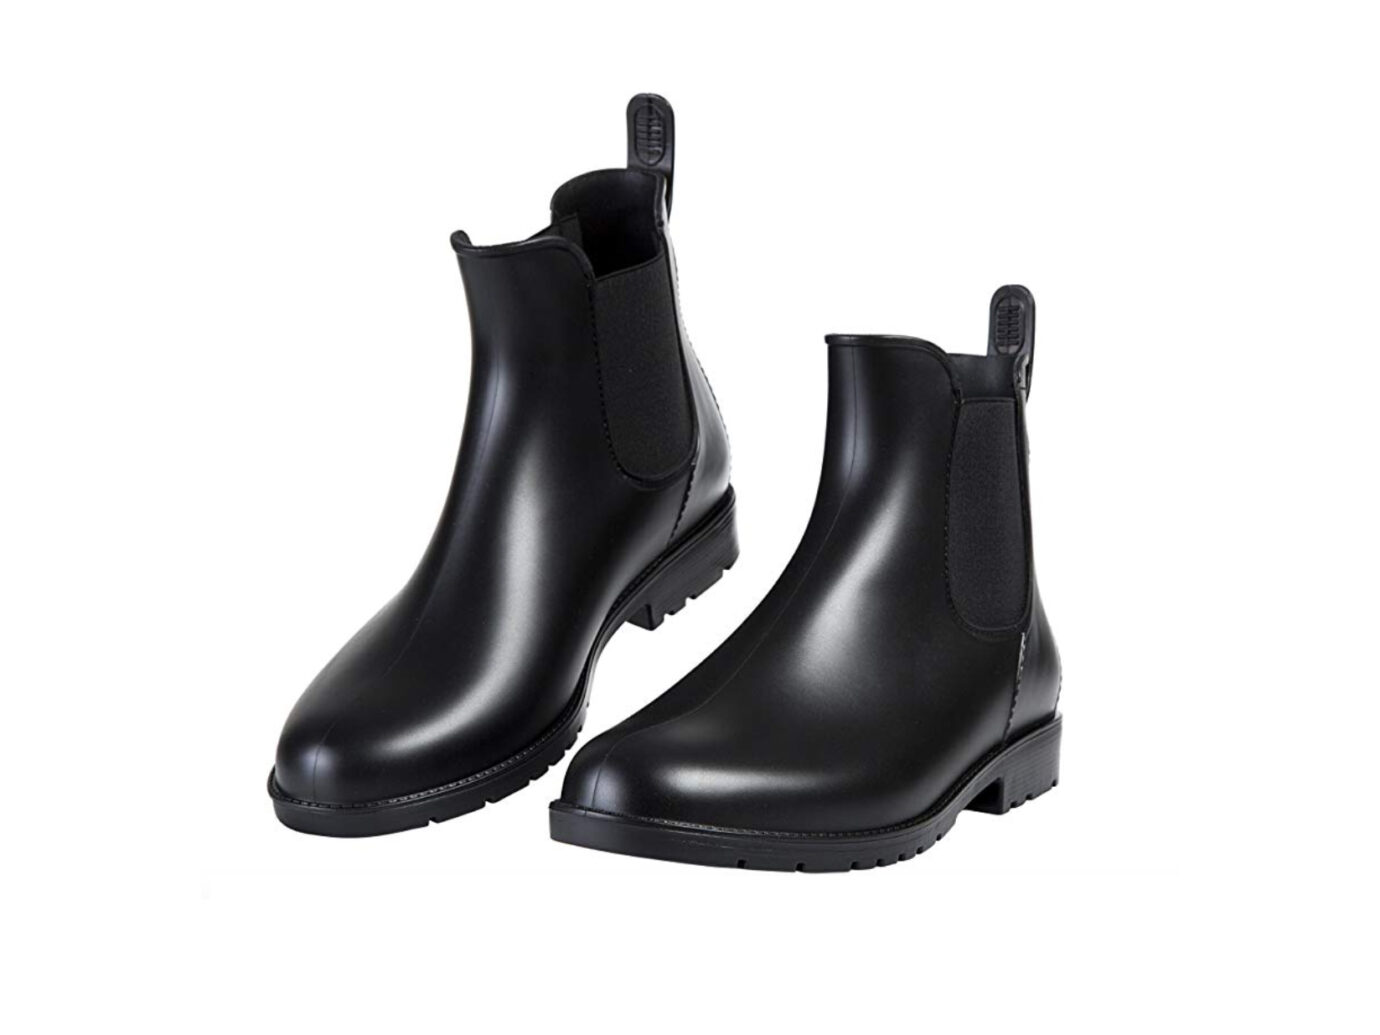 Asgard Women's Waterproof Chelsea Boot